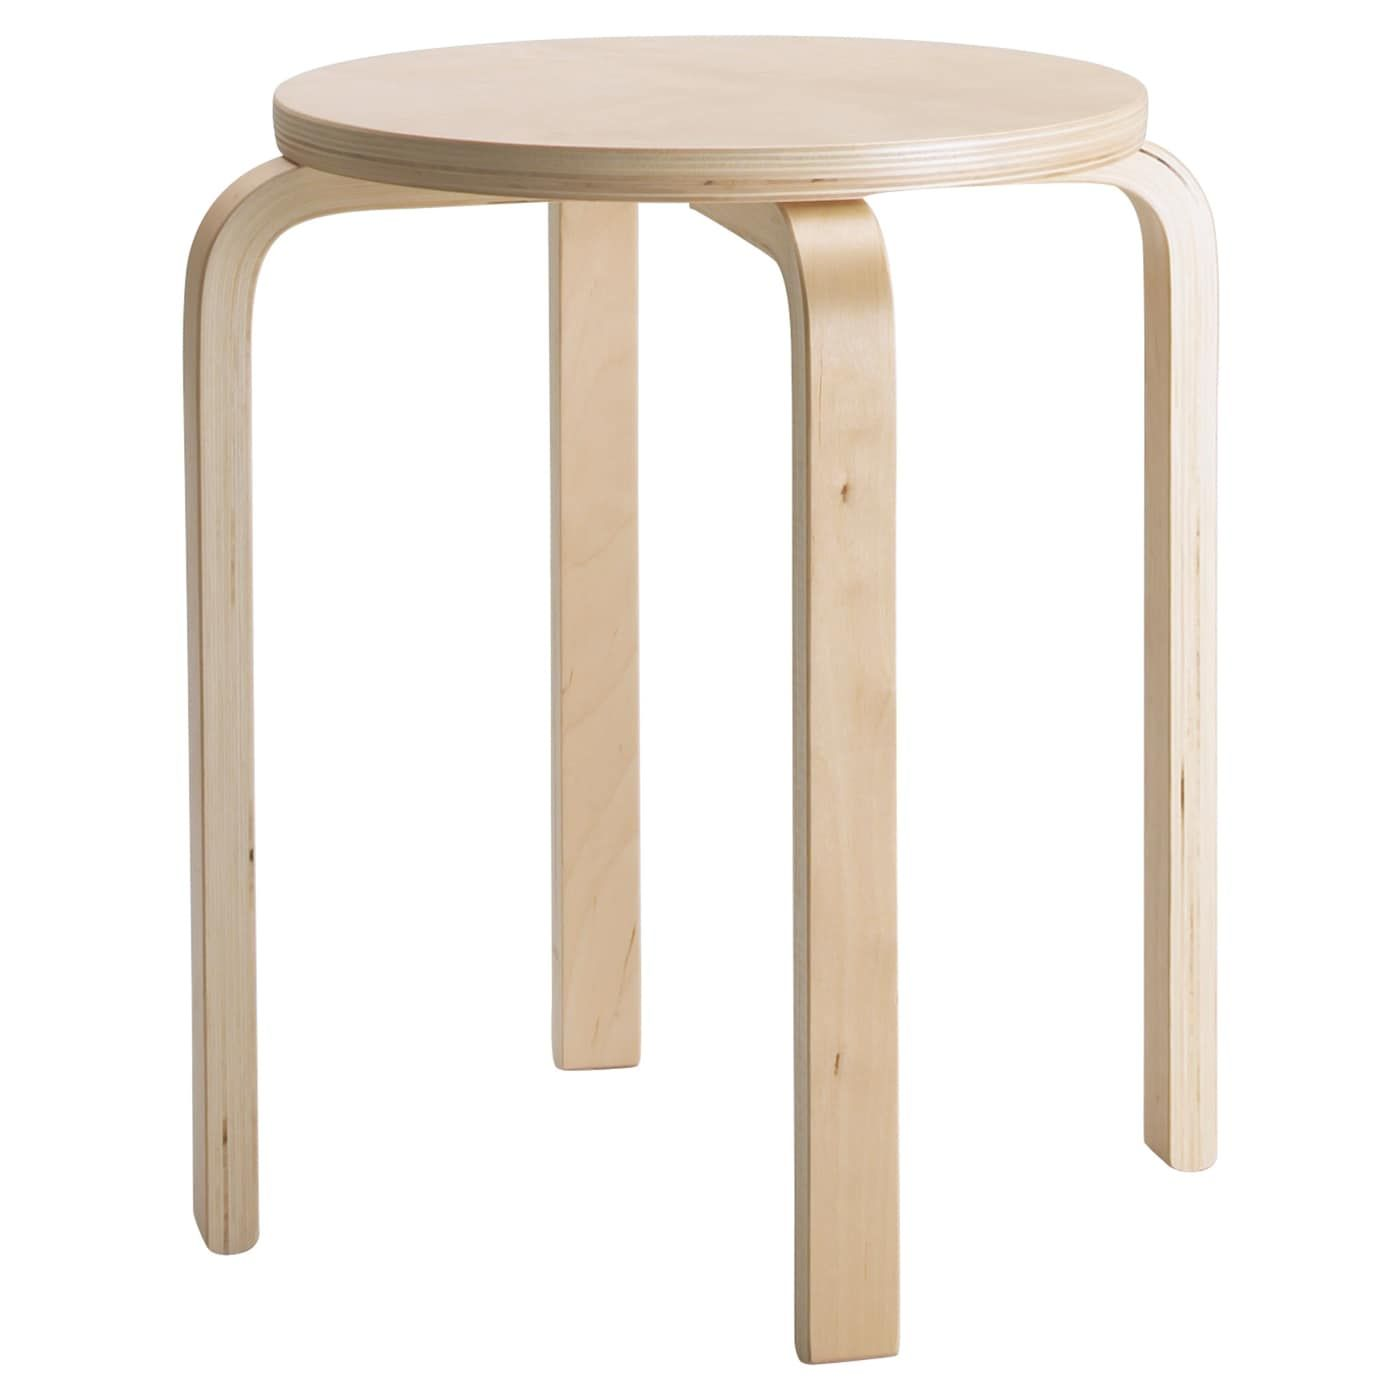 Wondrous Frosta Stool Birch Plywood Ikea In 2019 Stool Ikea Uwap Interior Chair Design Uwaporg